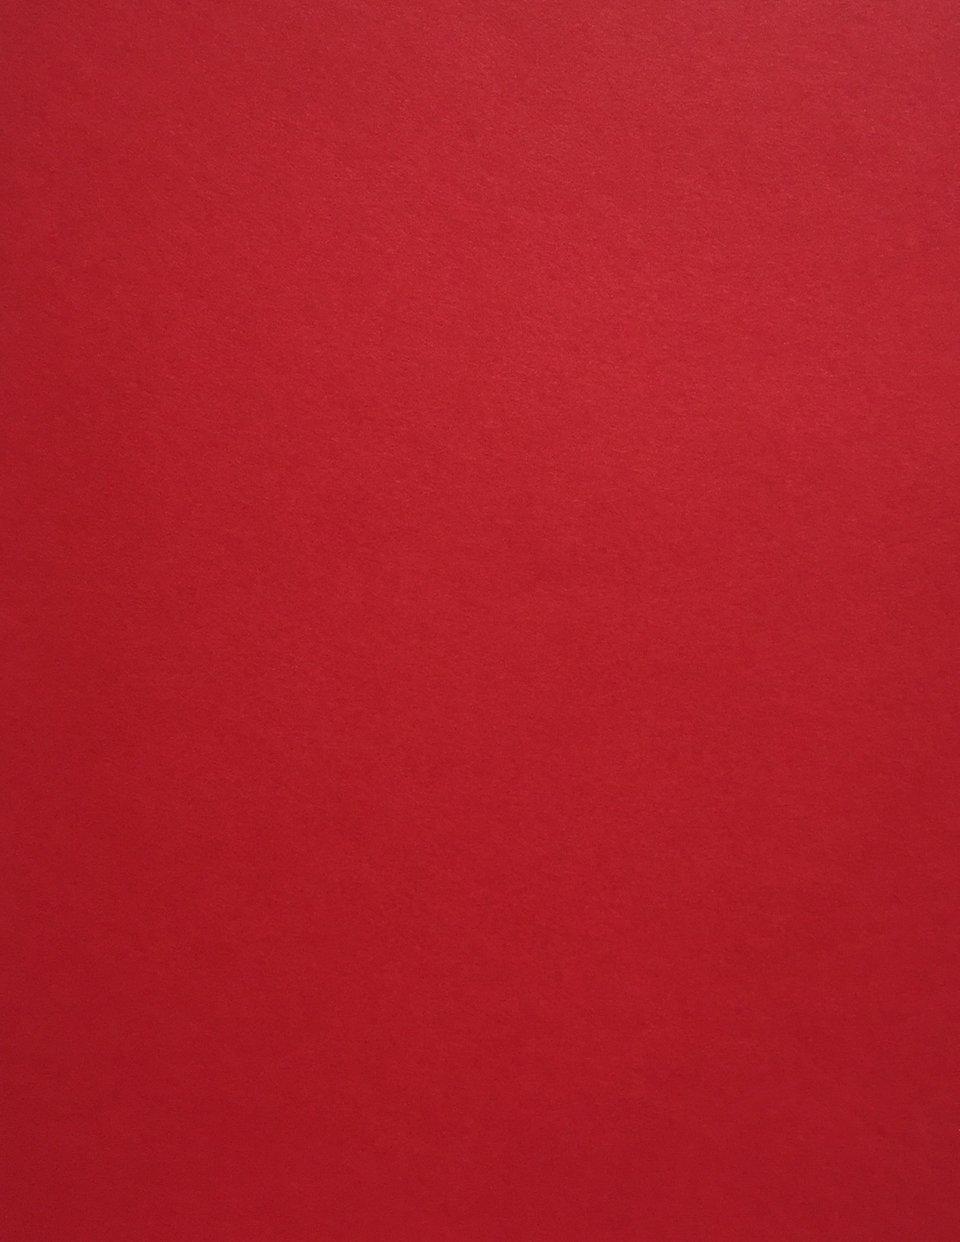 Premium Cover 50 Sheets from Cardstock Warehouse Pink Lemonade Cardstock Paper 8.5 x 11 inch 65 lb